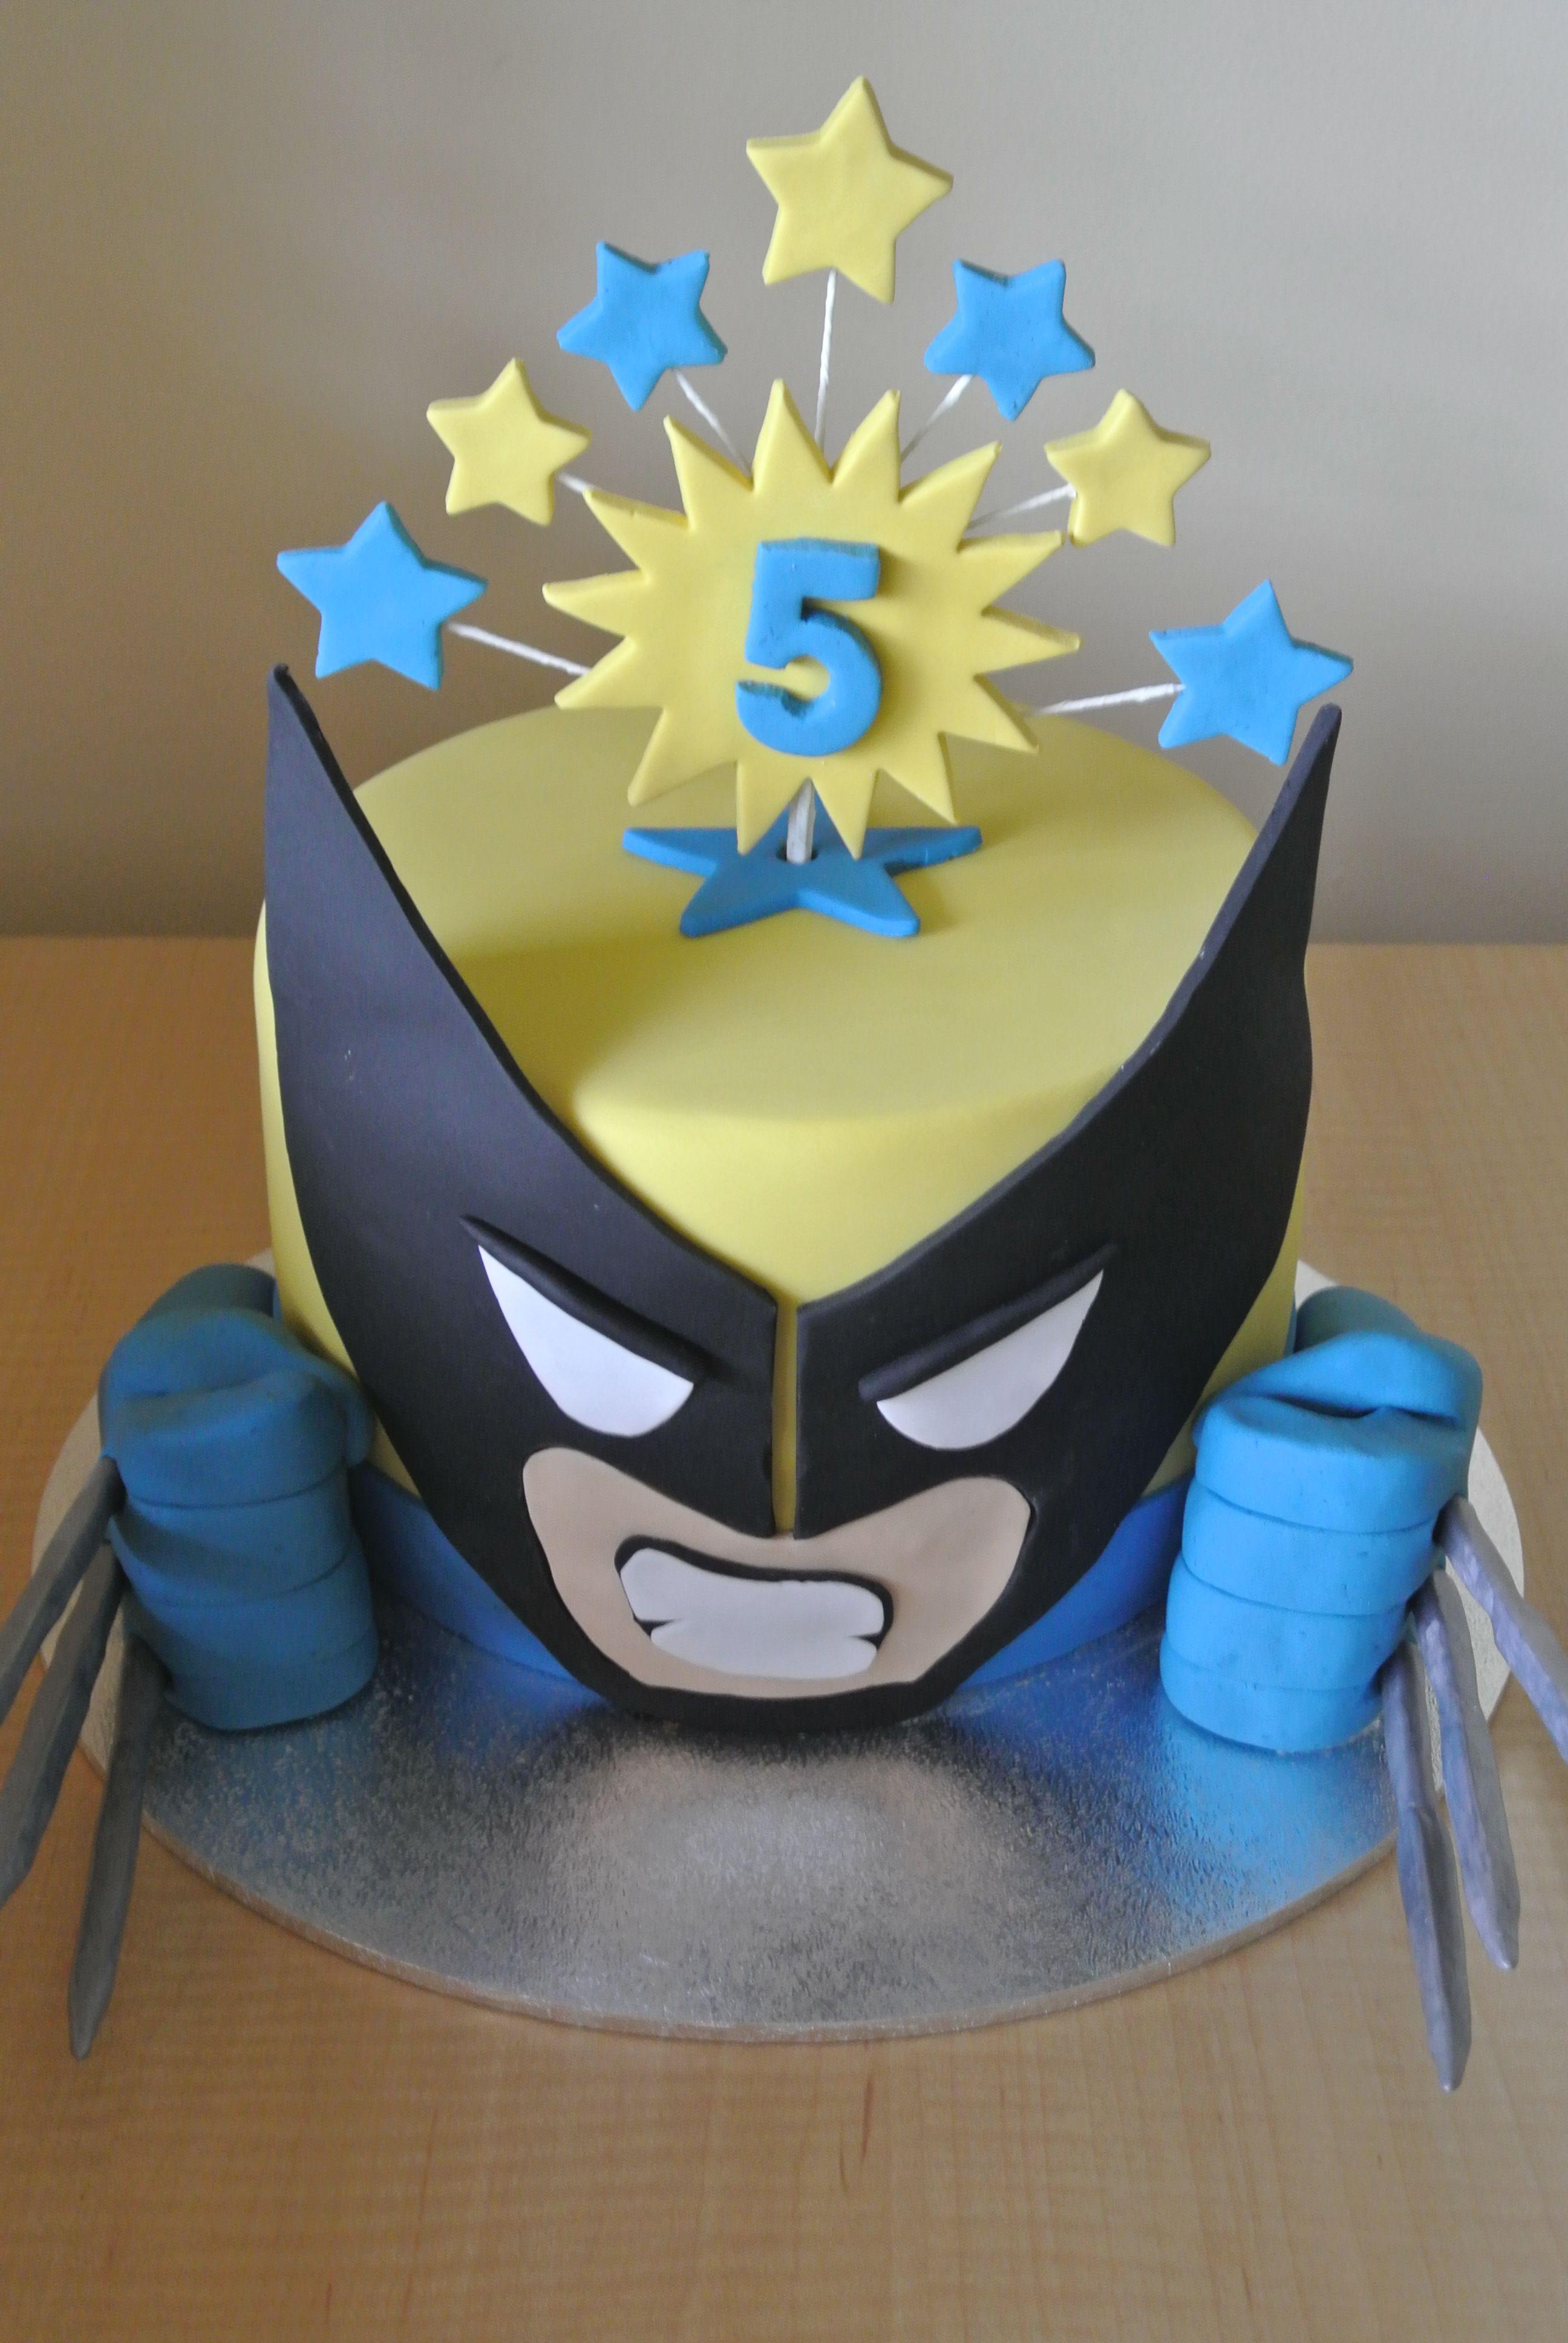 17 Super Cool Superhero Cakes Smart Party Ideas